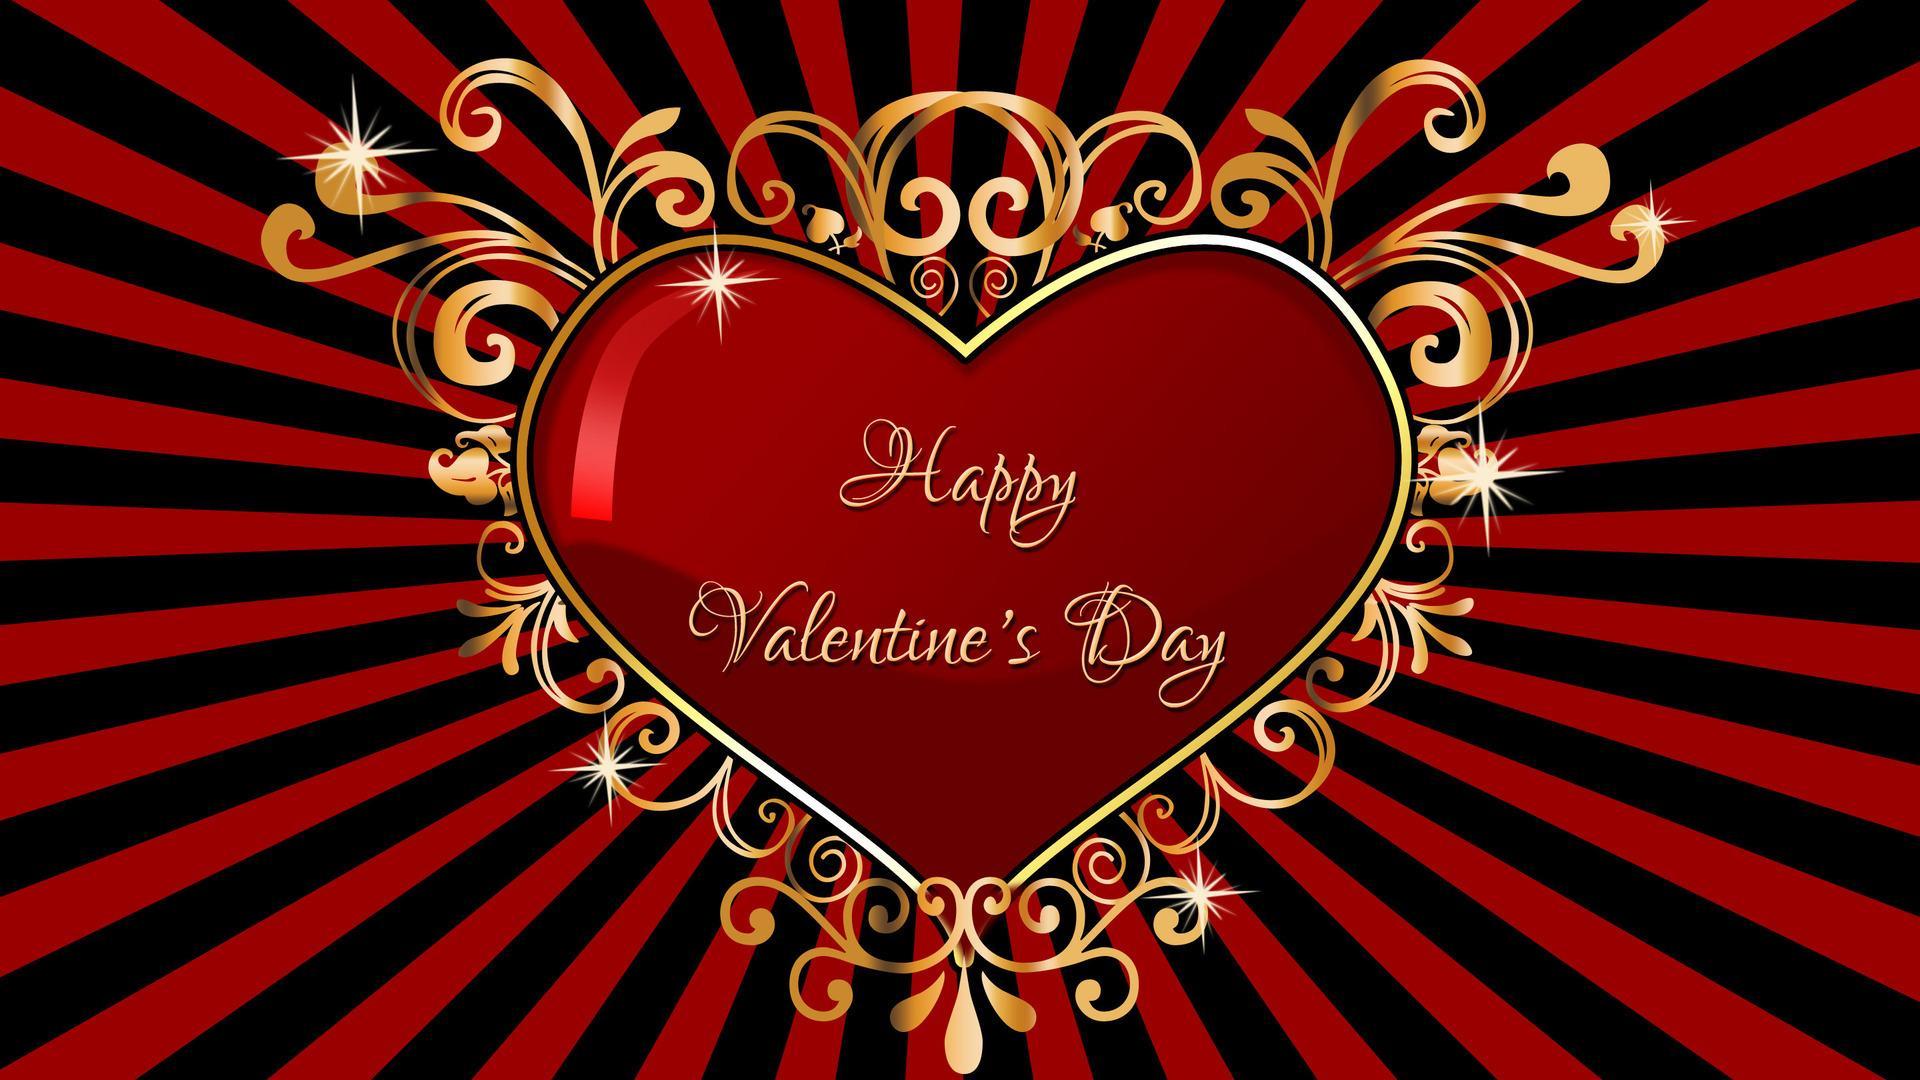 disney valentines day wallpaper which is under the valentines day 1920x1080